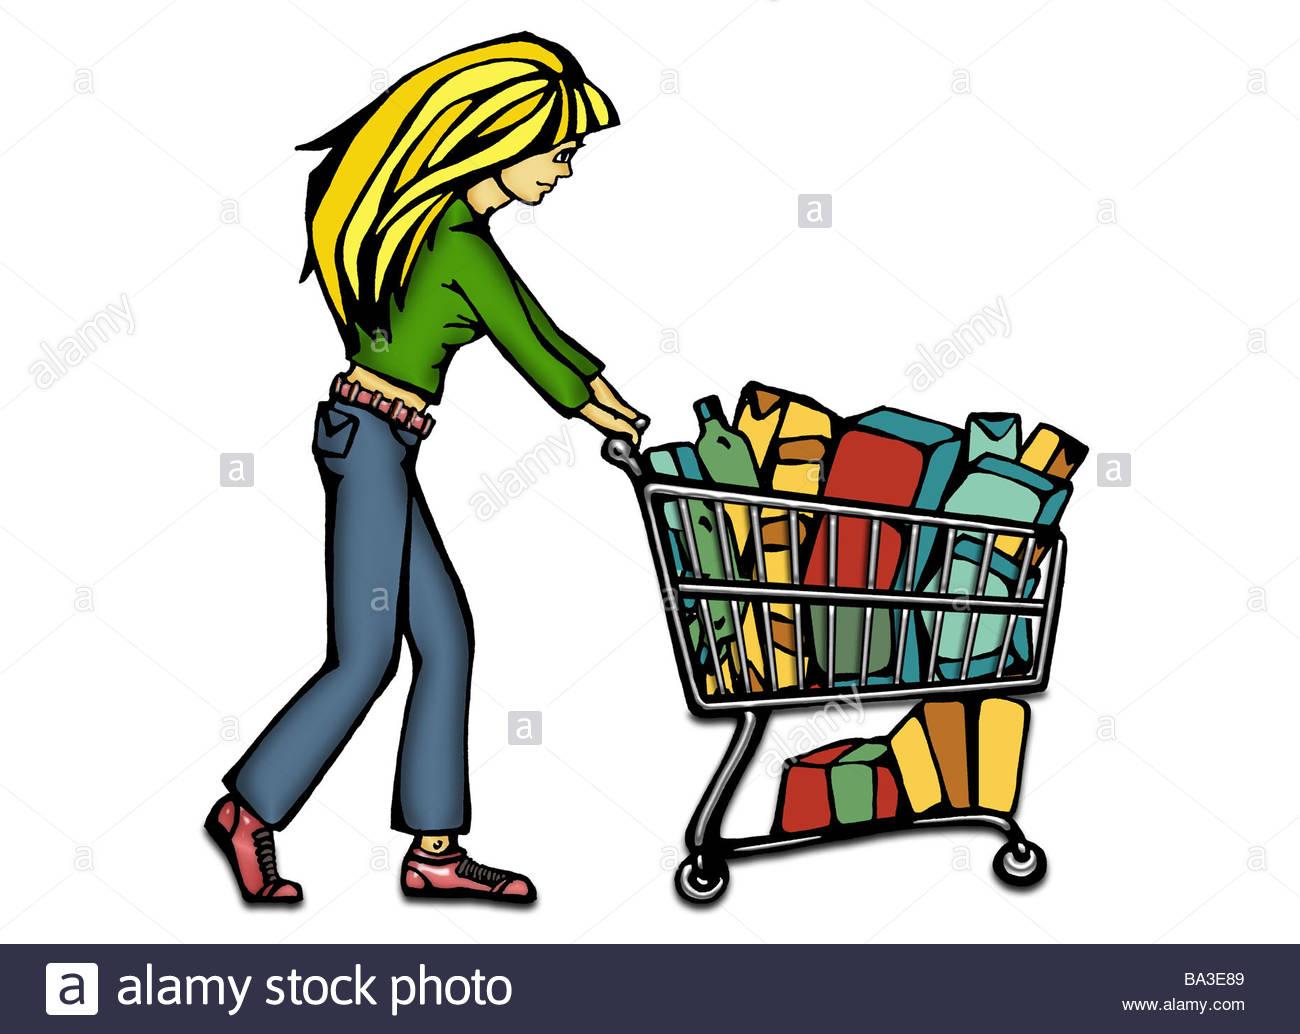 1300x1034 Illustration Manga Woman Young Blond Shopping Carts Graphics